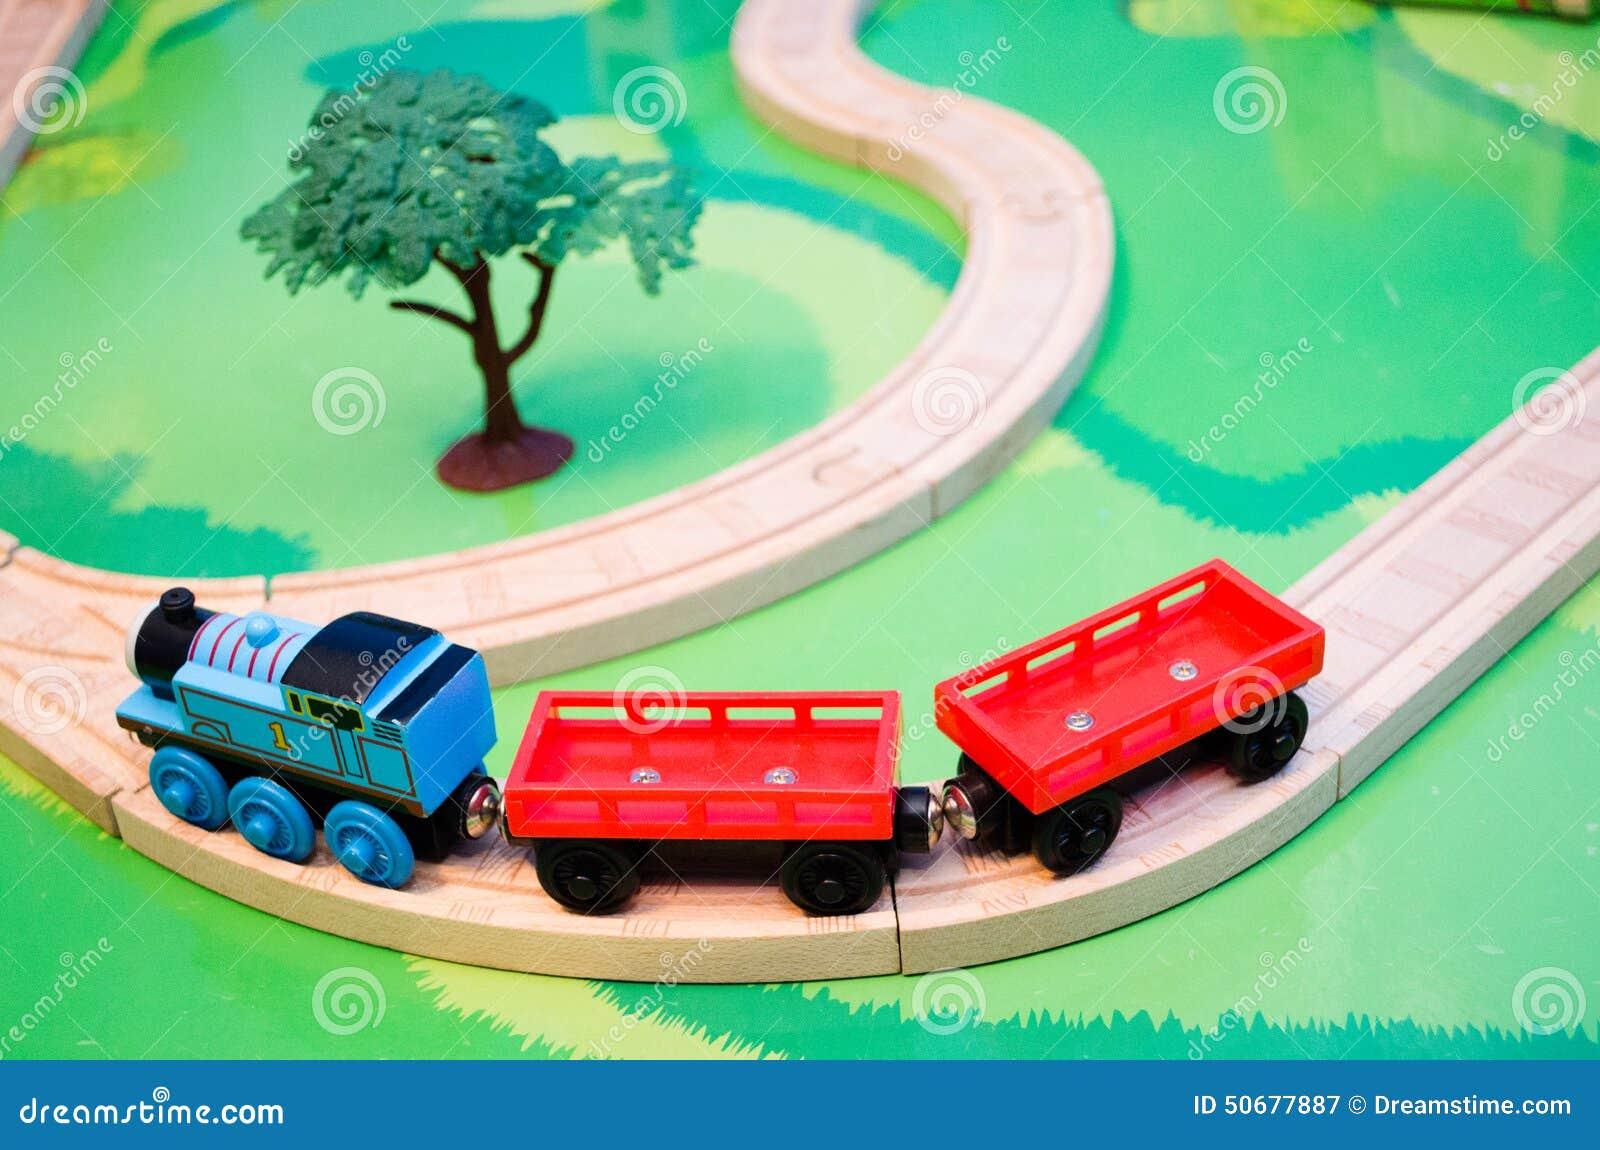 Download 玩具火车集合 库存图片. 图片 包括有 启用, 角落, 子项, 舍入, 可弯的, 坦克, 红色, 童年, 玩具 - 50677887